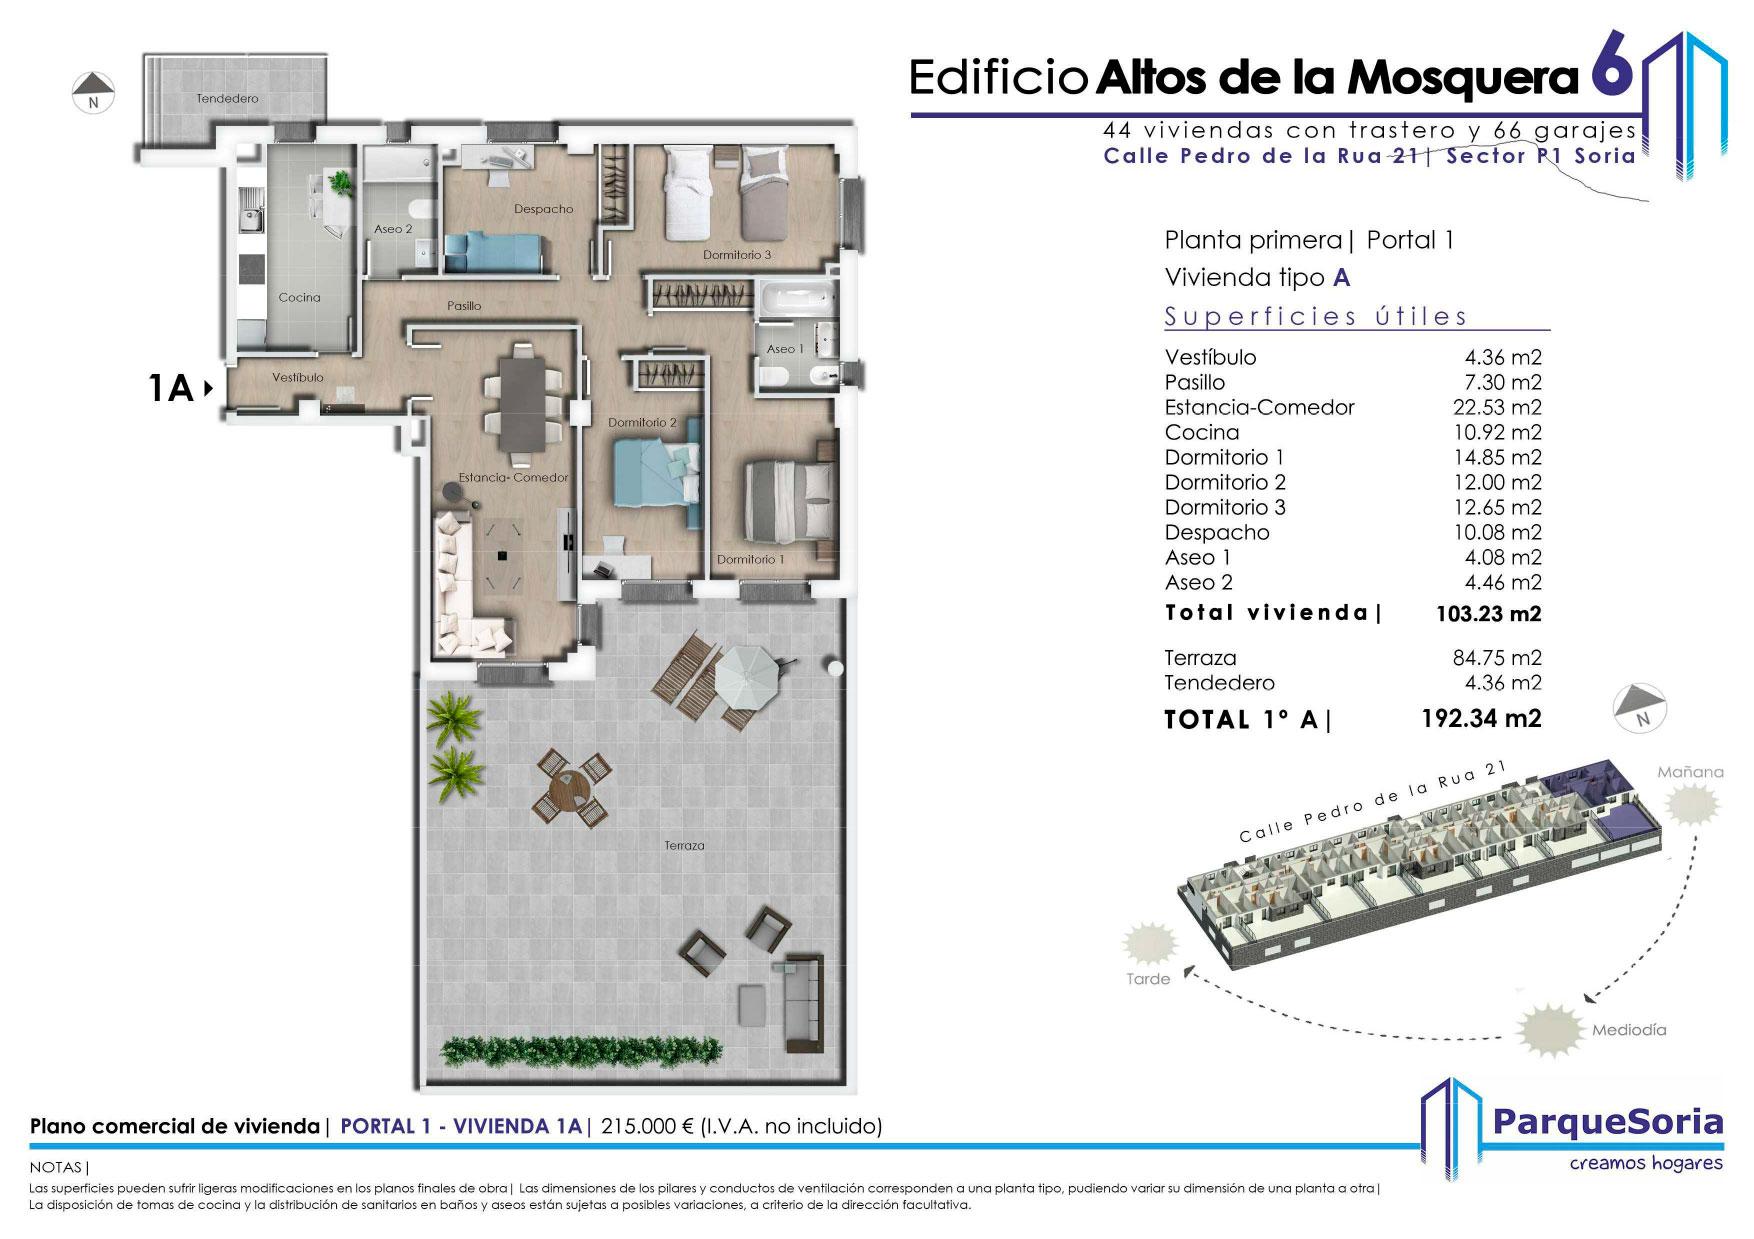 Parquesoria-Altos-de-la-mosquera-6-1A-2